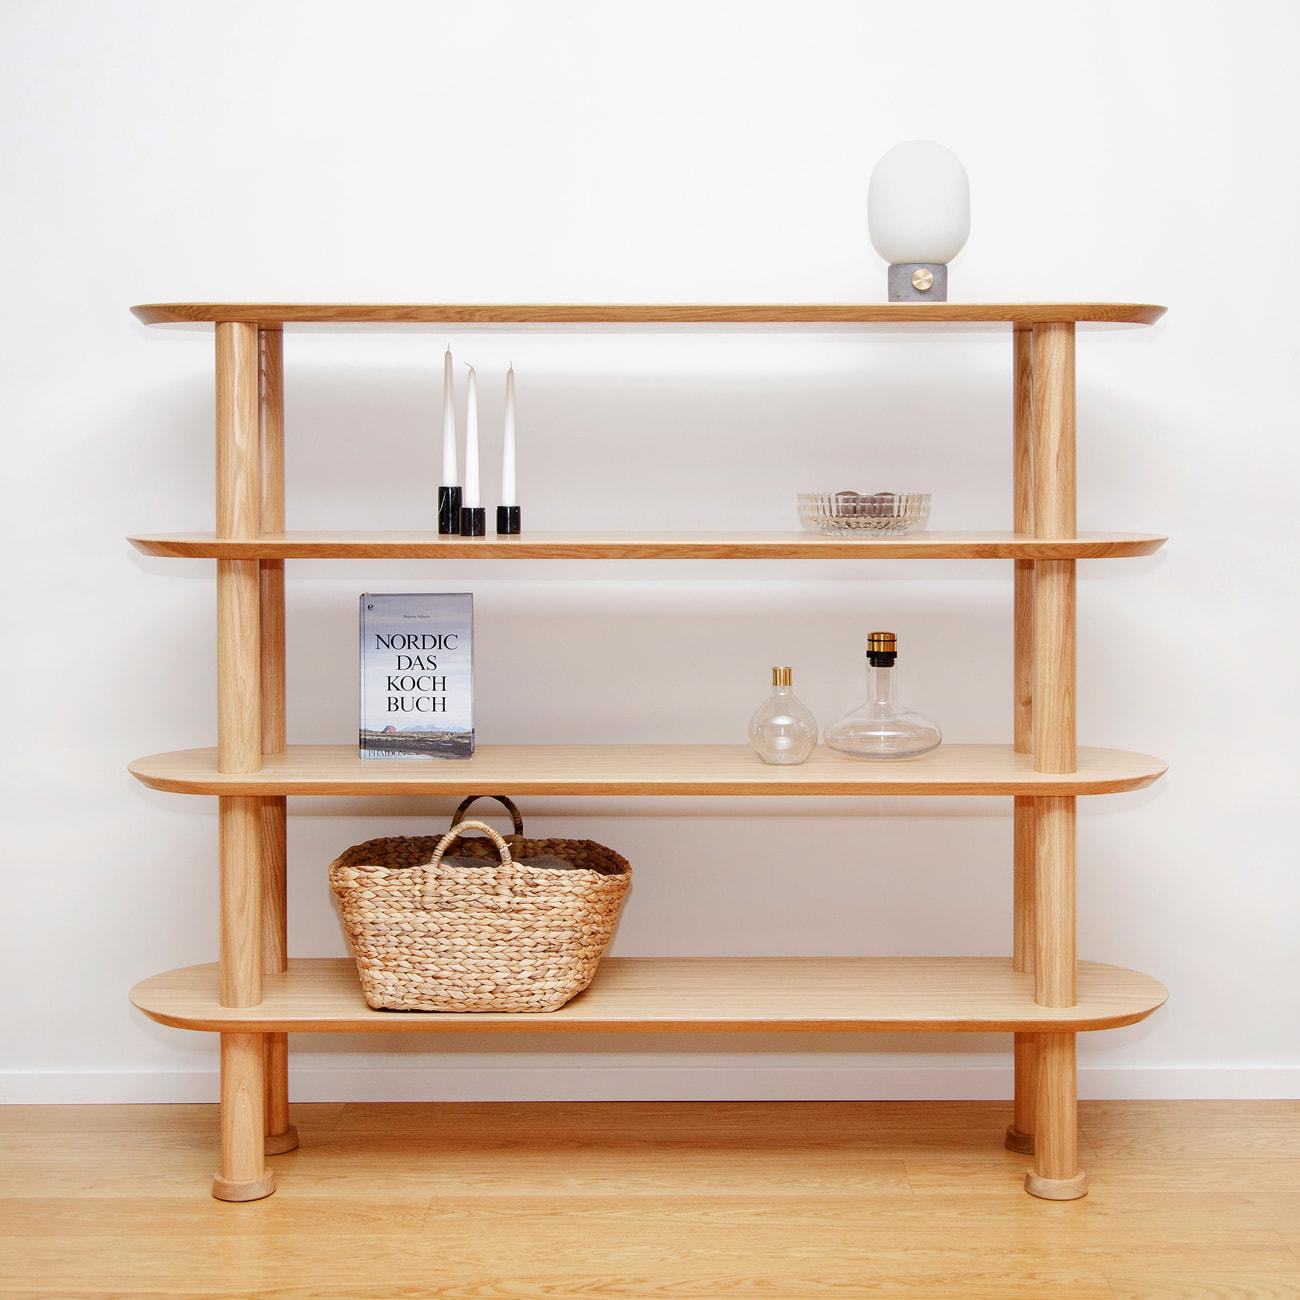 furniture-remix-baton-shelf-the-hansen-family-1